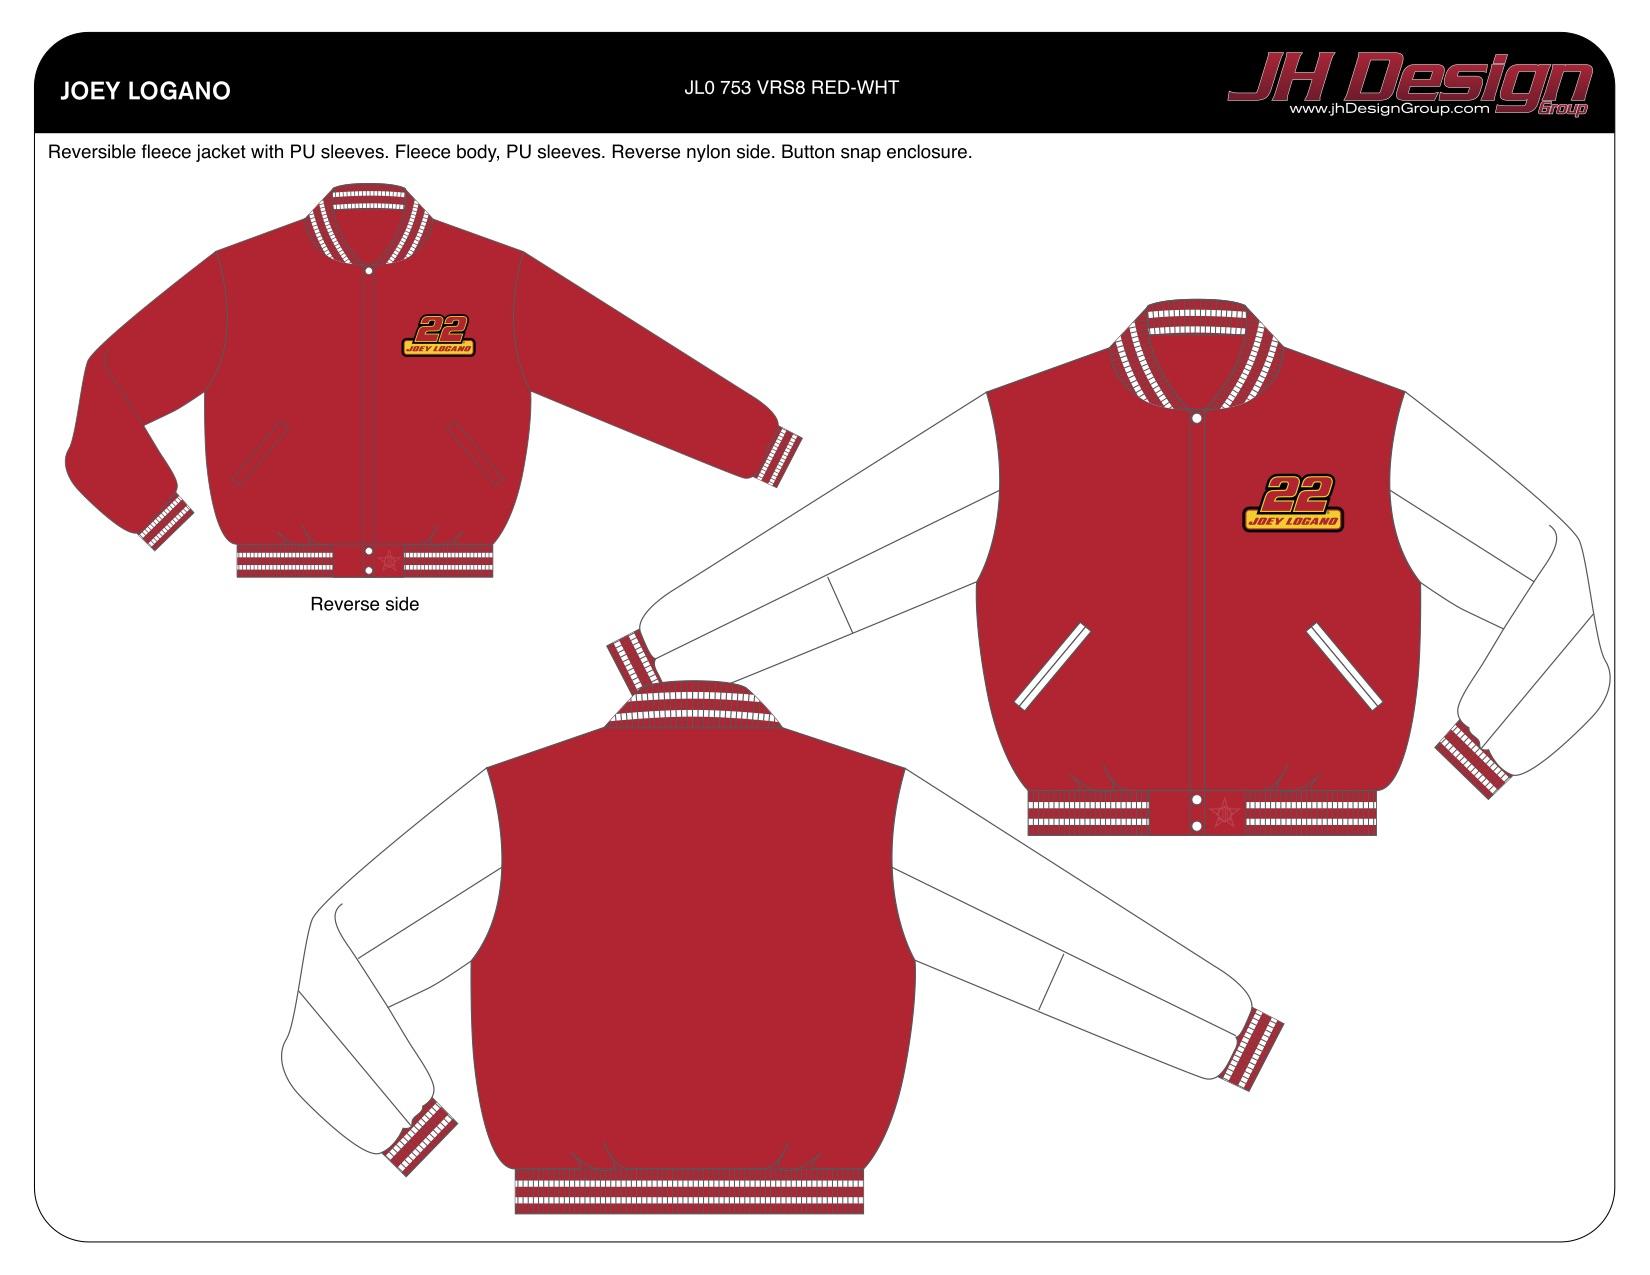 JL0 753 VRS8 RED-WHT